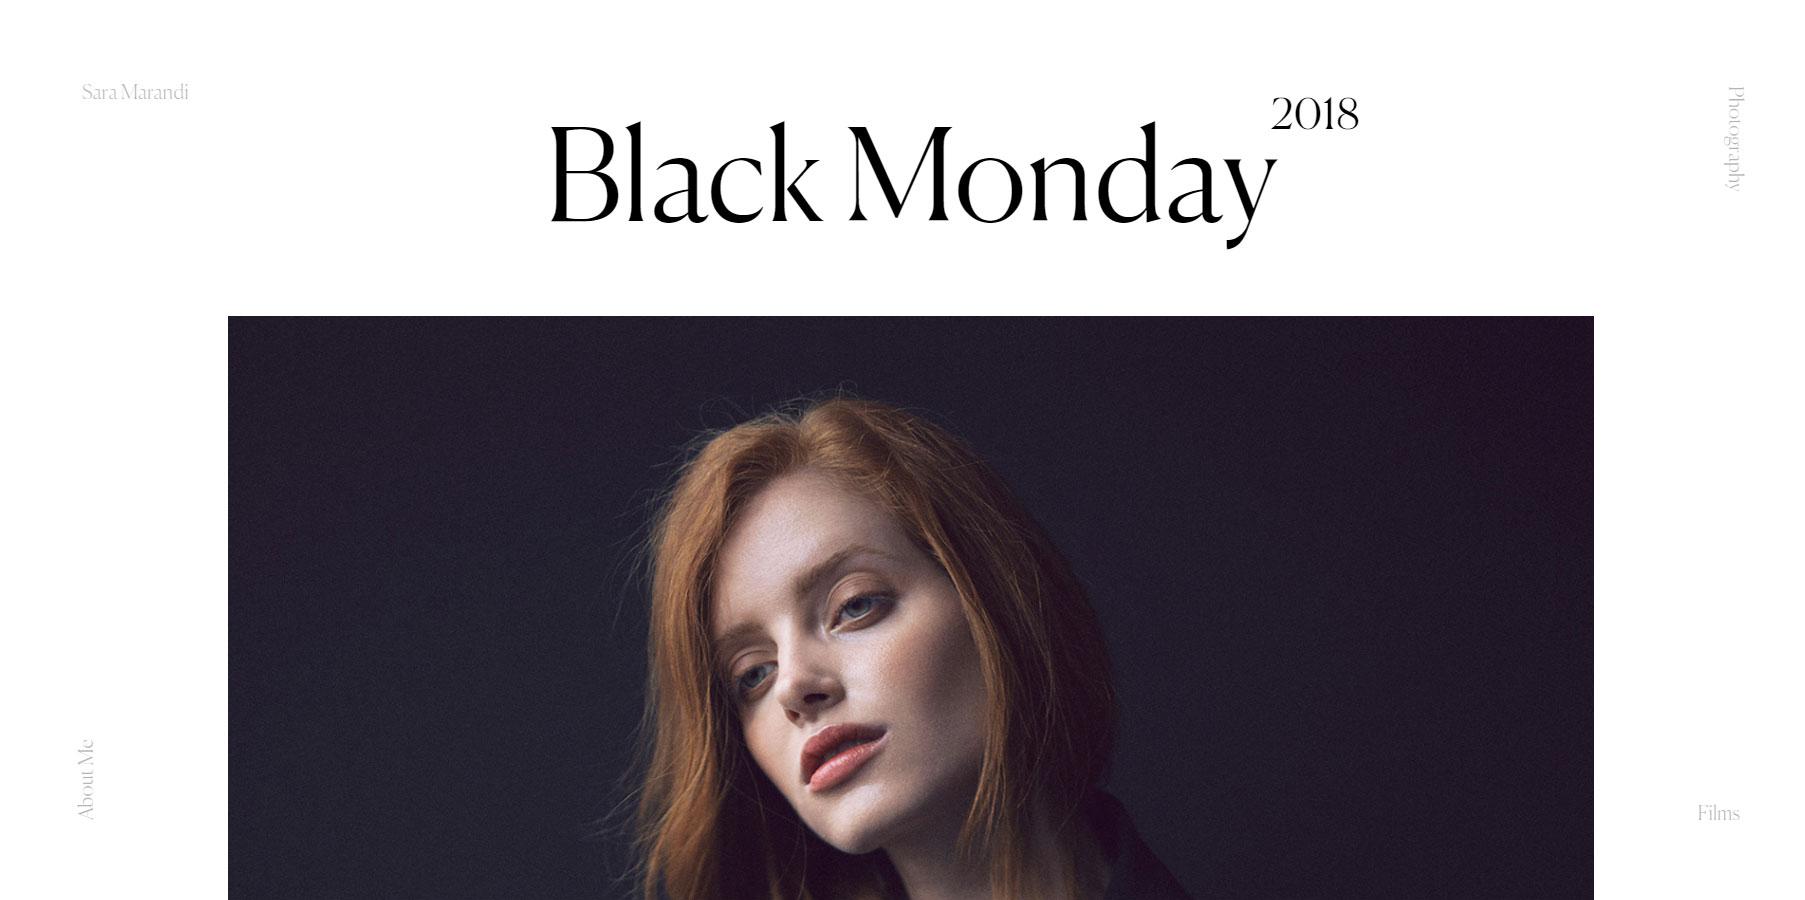 Sara Marandi - Website of the Day